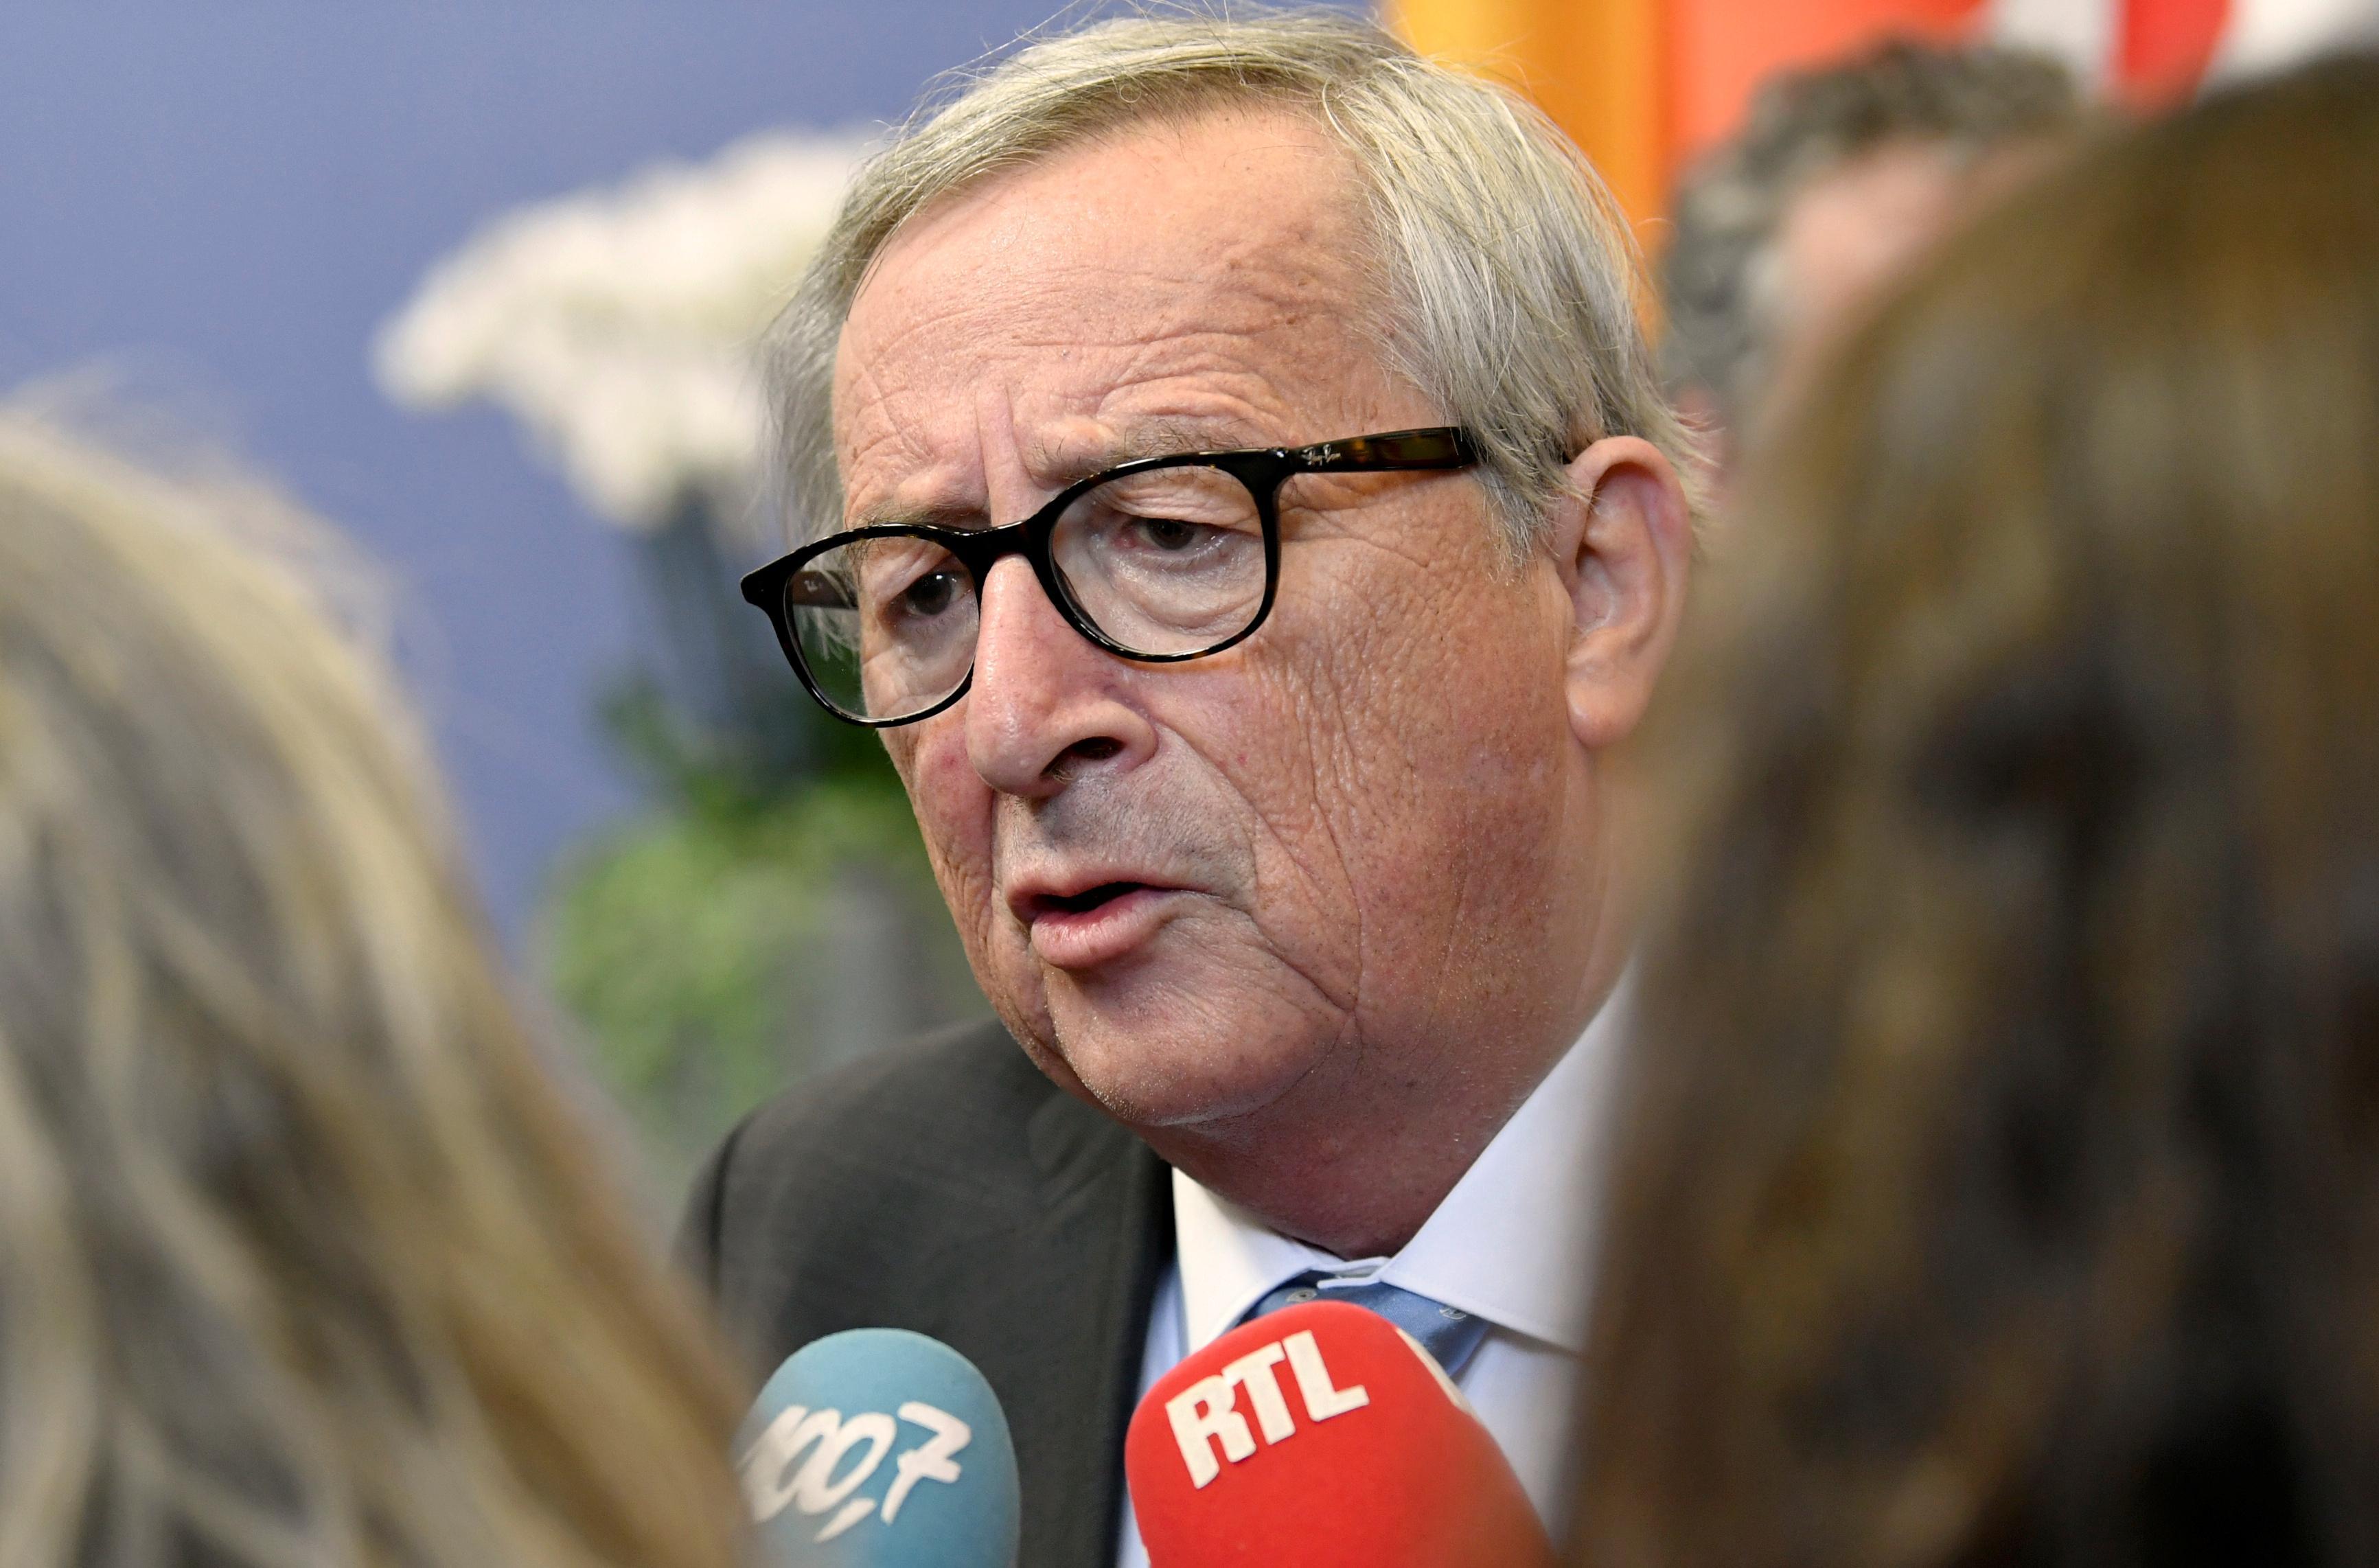 EU's Juncker cuts holiday short for urgent surgery - statement